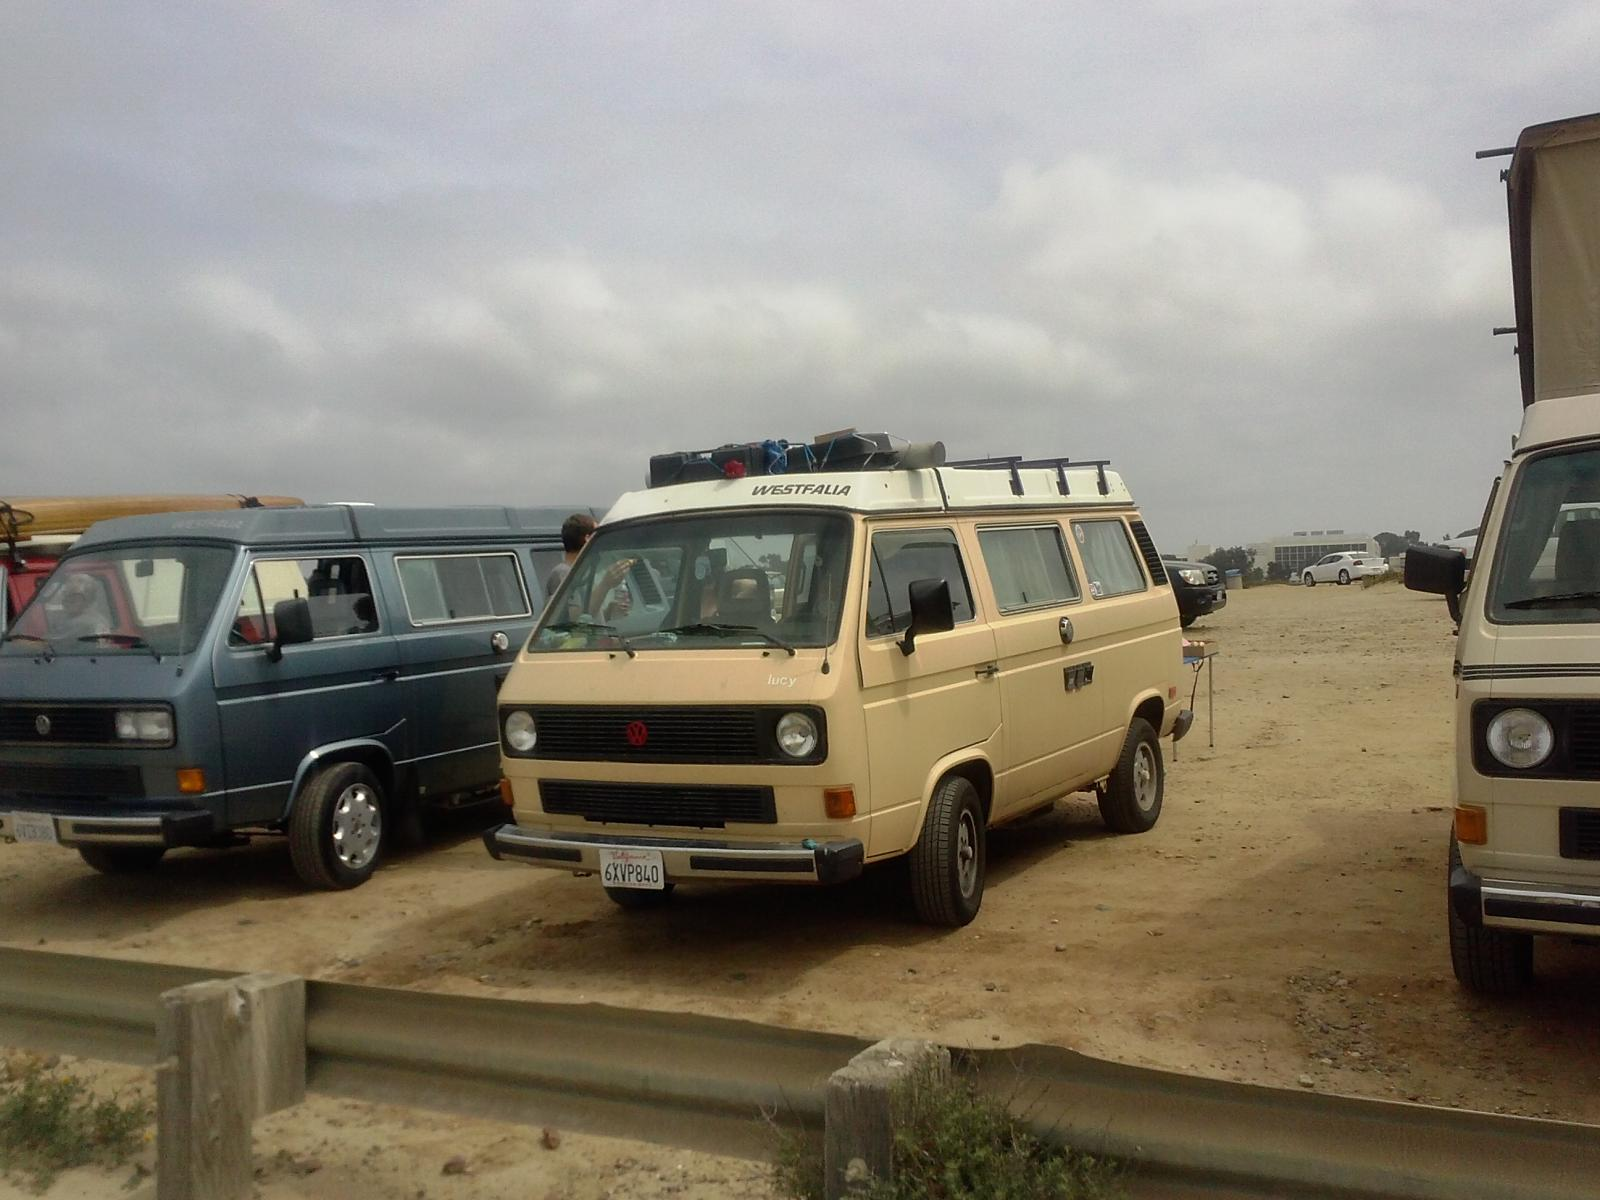 San Diego meet 4/7/13